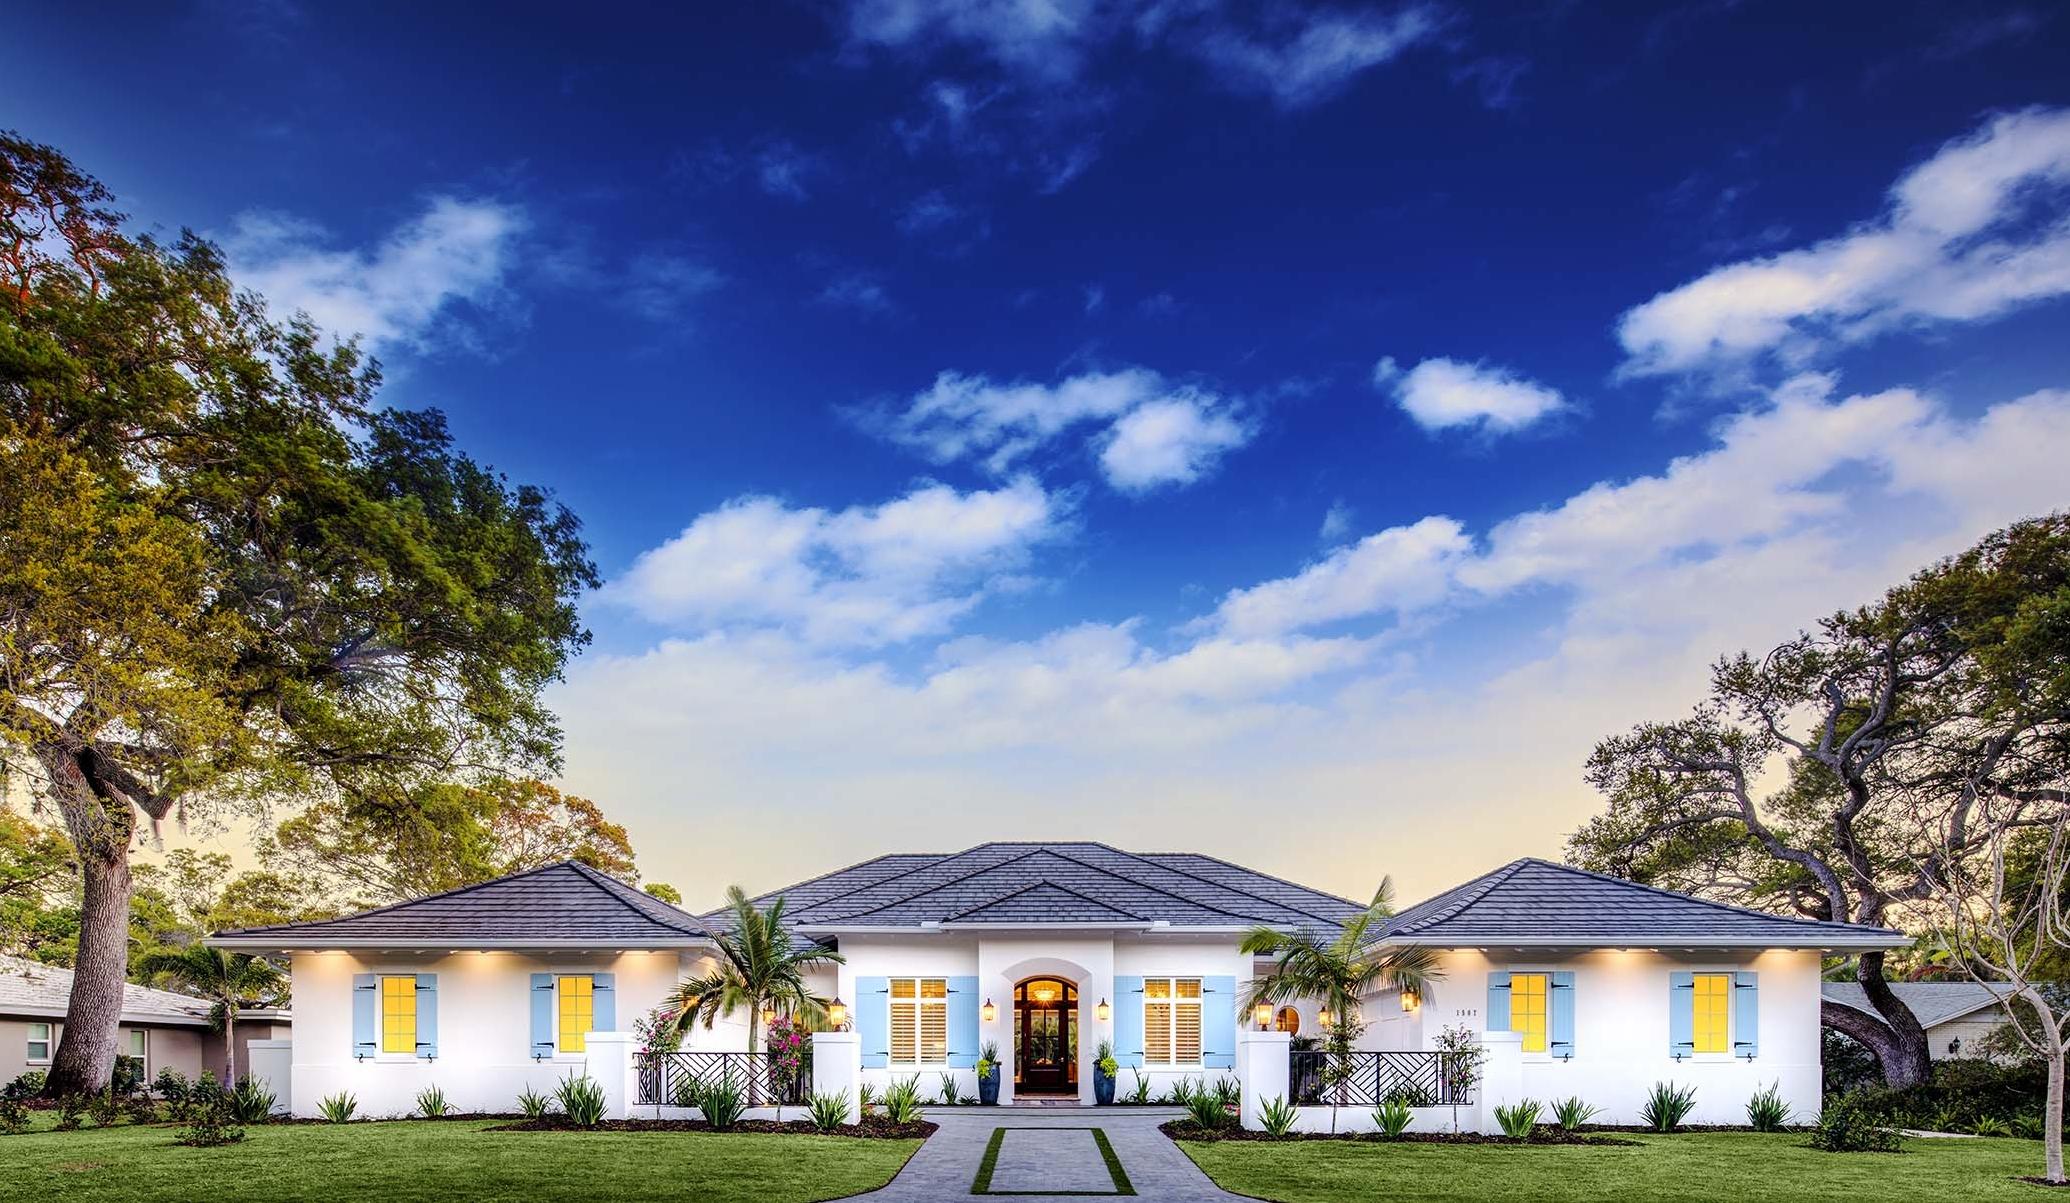 Custom Homes by Heritage Builders - Sarasota, Florida